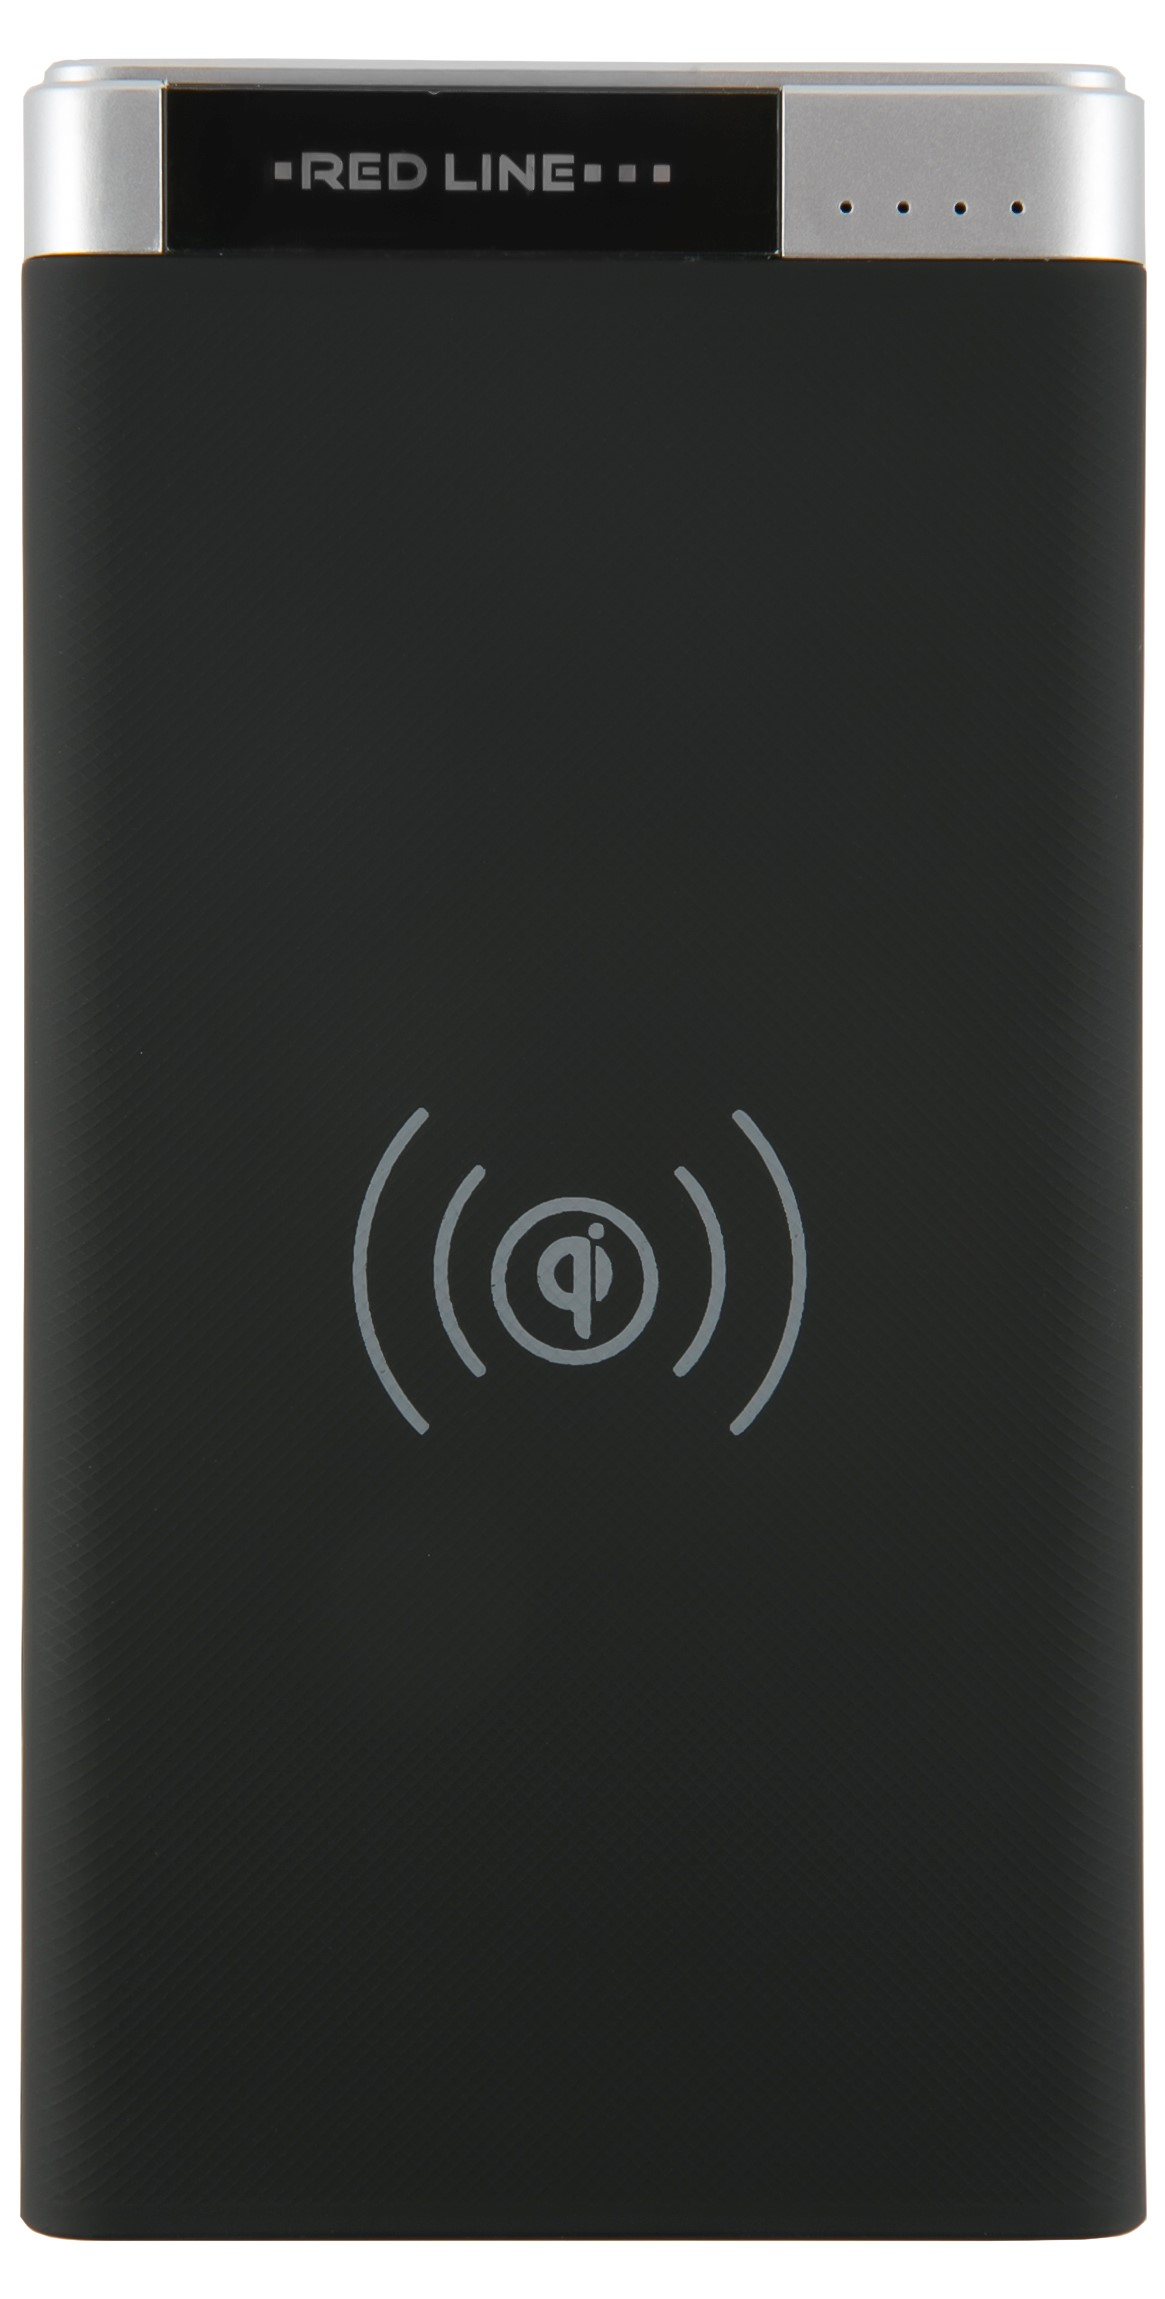 Внешний аккумулятор RedLine WS-T20 6000 mAh с функцией беспроводной зарядки black аккумулятор gopro portable power pack 6000 mah azpbc 001